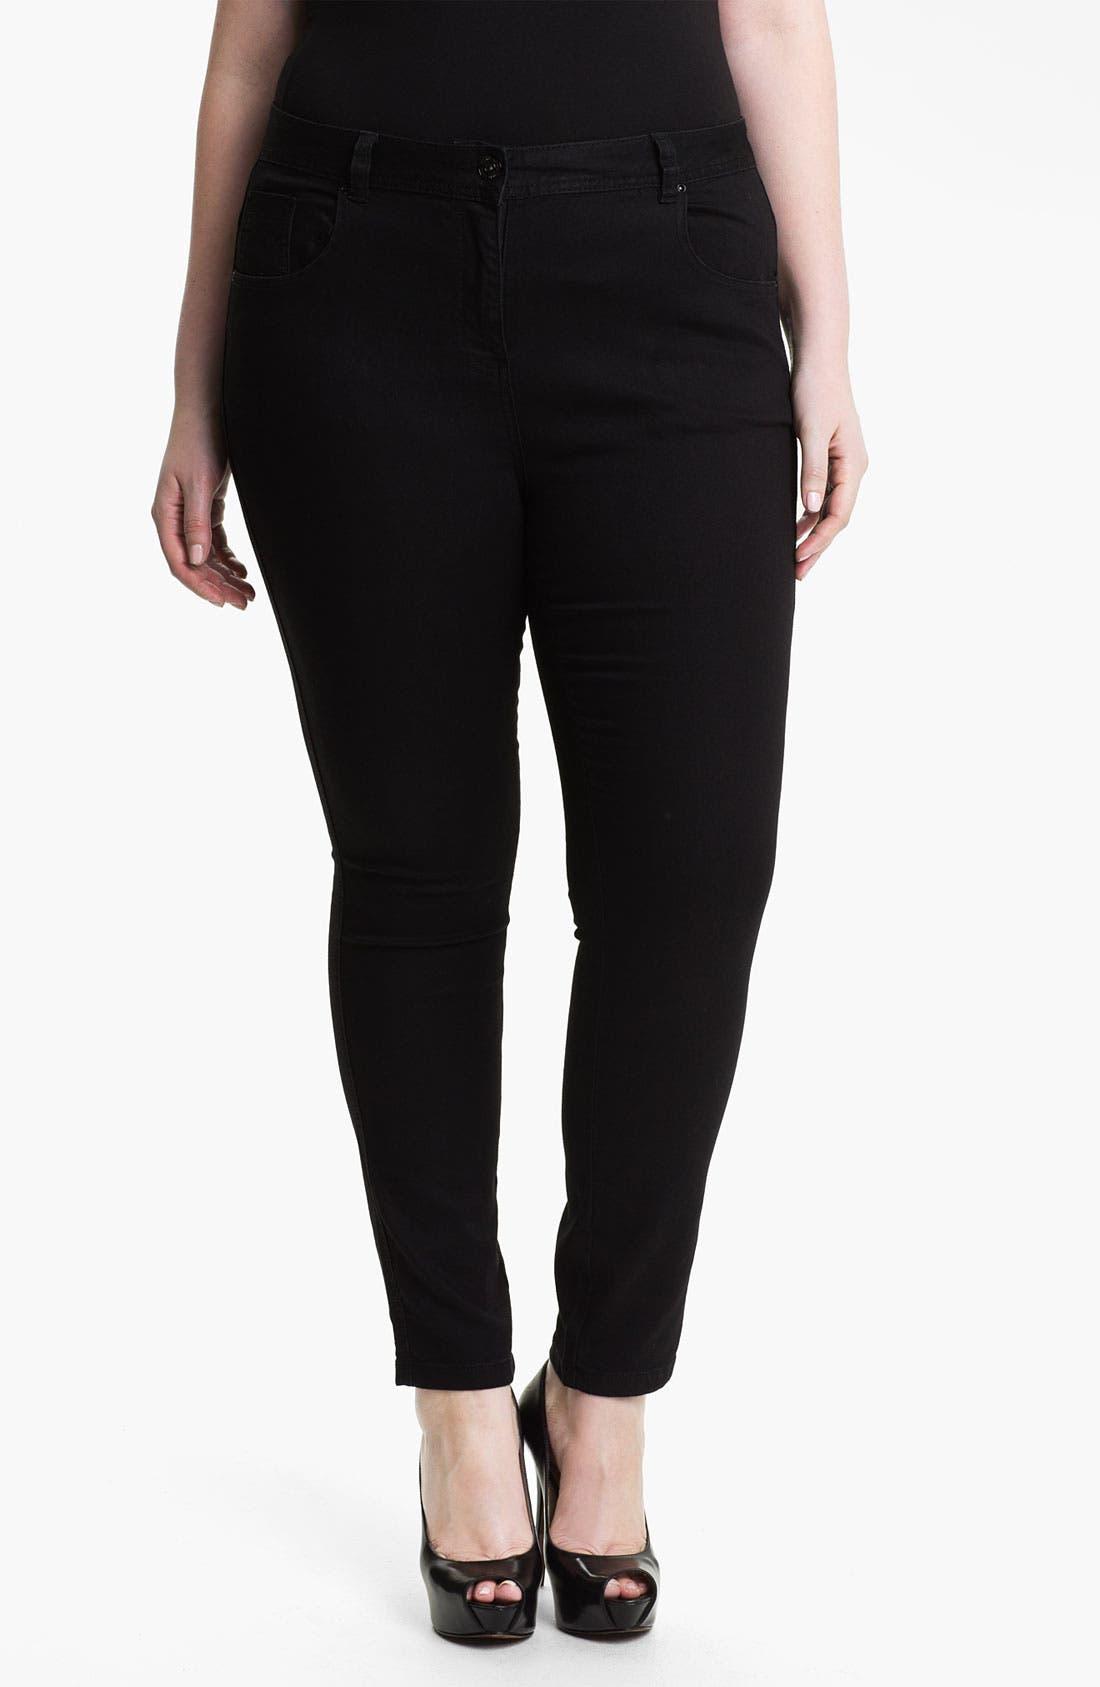 Alternate Image 1 Selected - Evans 'Super Stretch' Jeans (Plus Size)